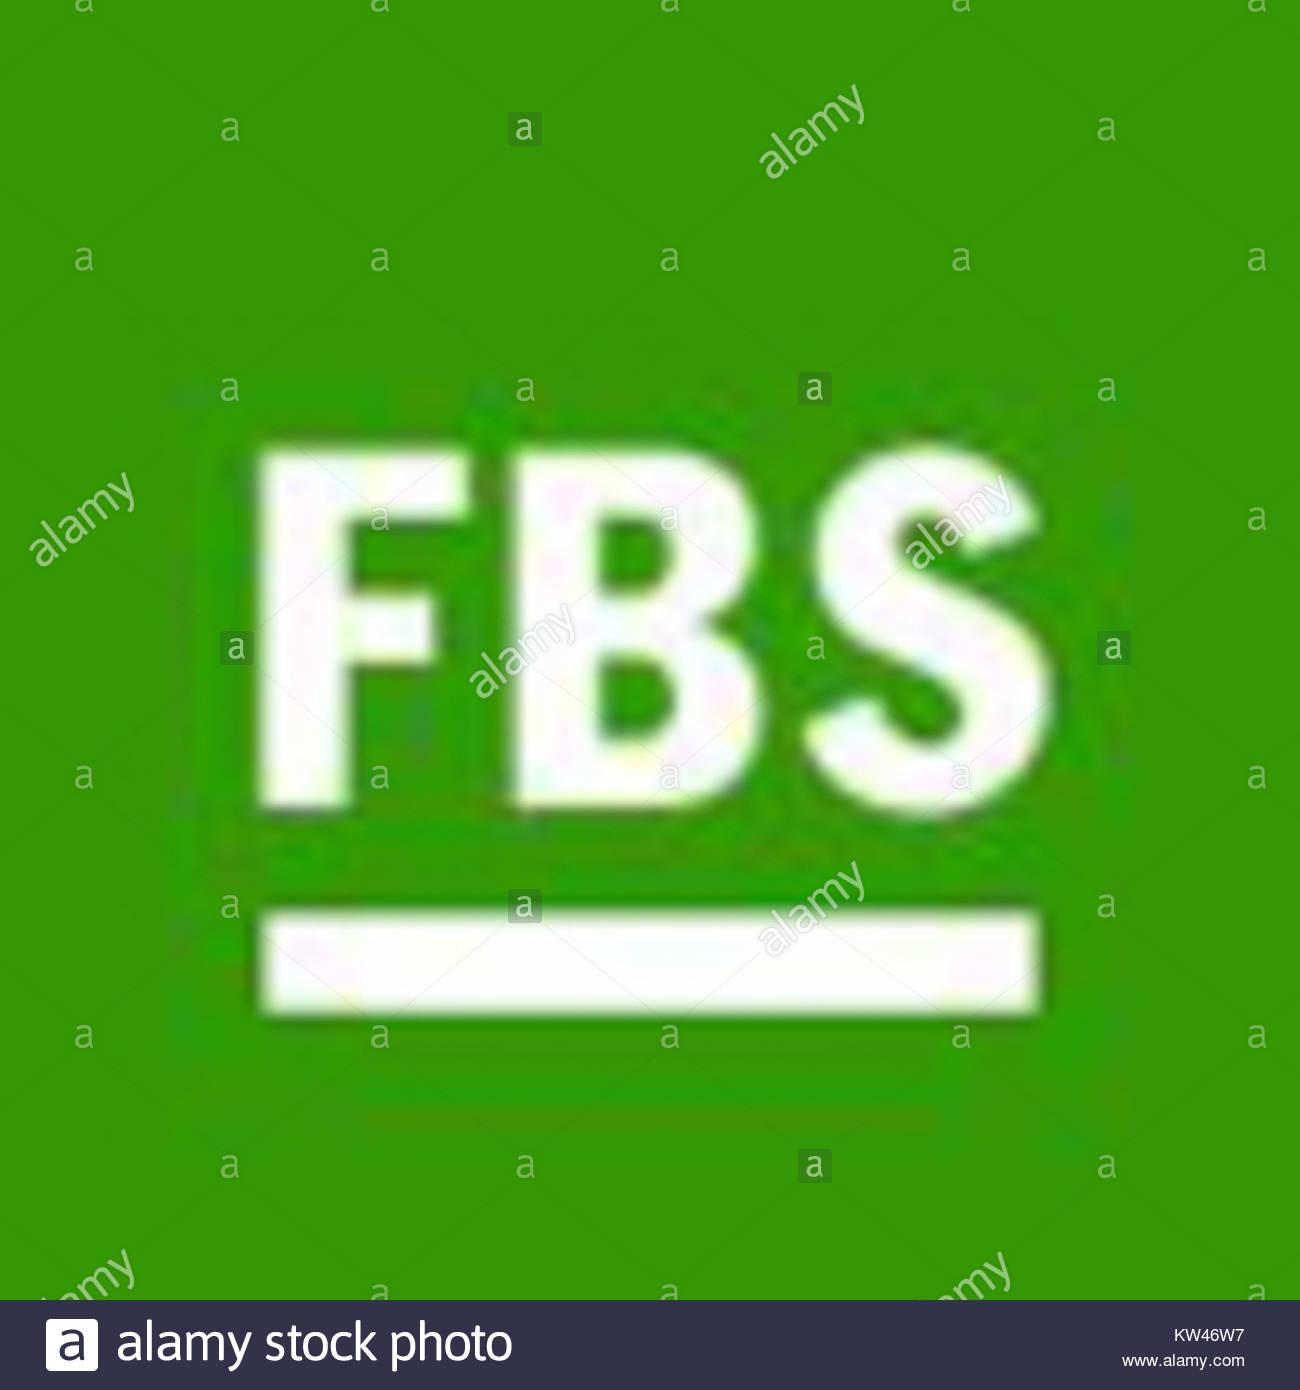 fbs company